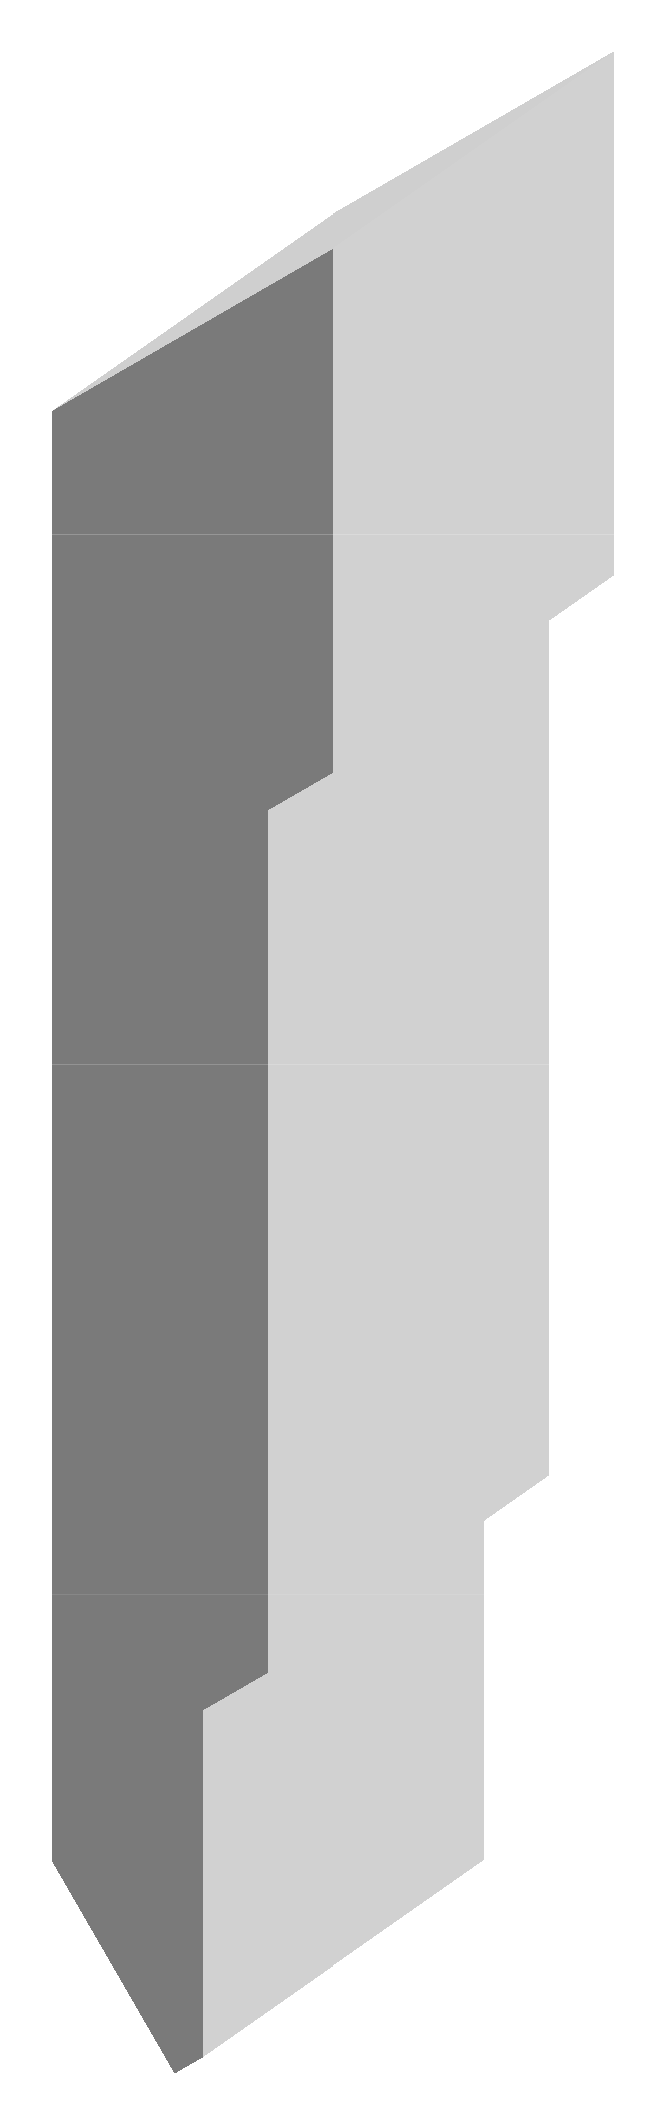 Z1180 CROWN